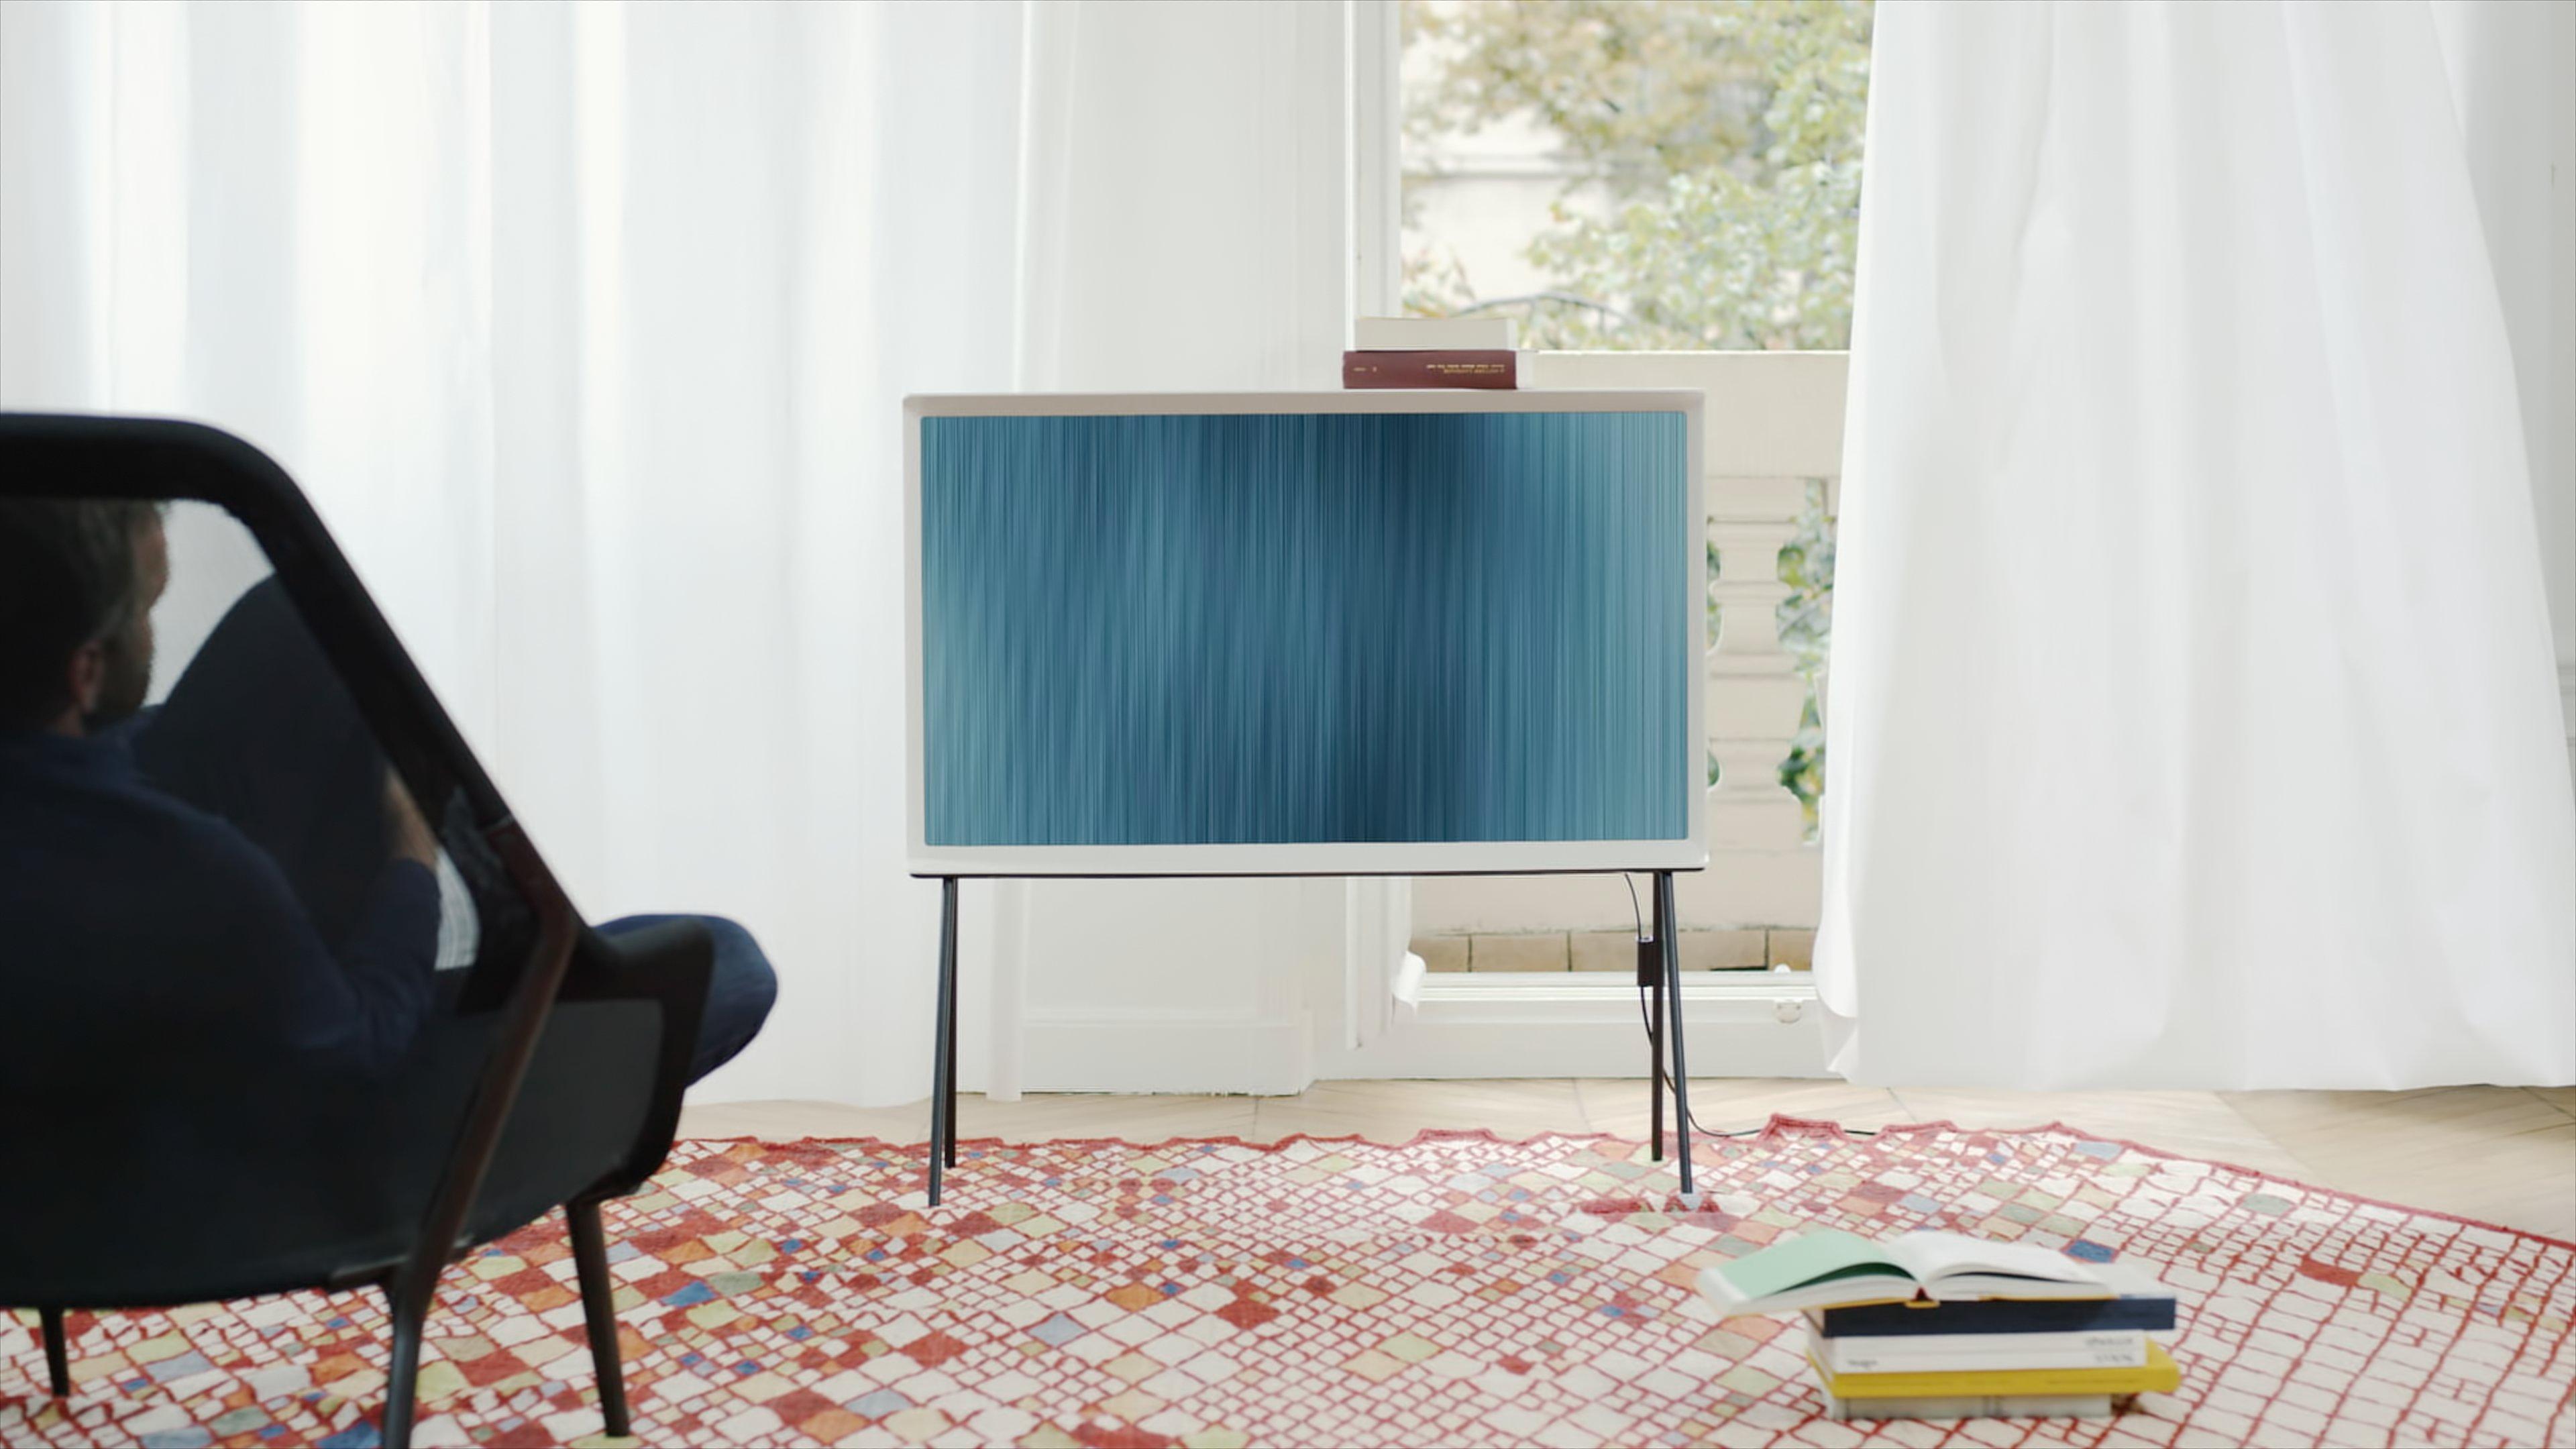 Samsung Serif Smart TV